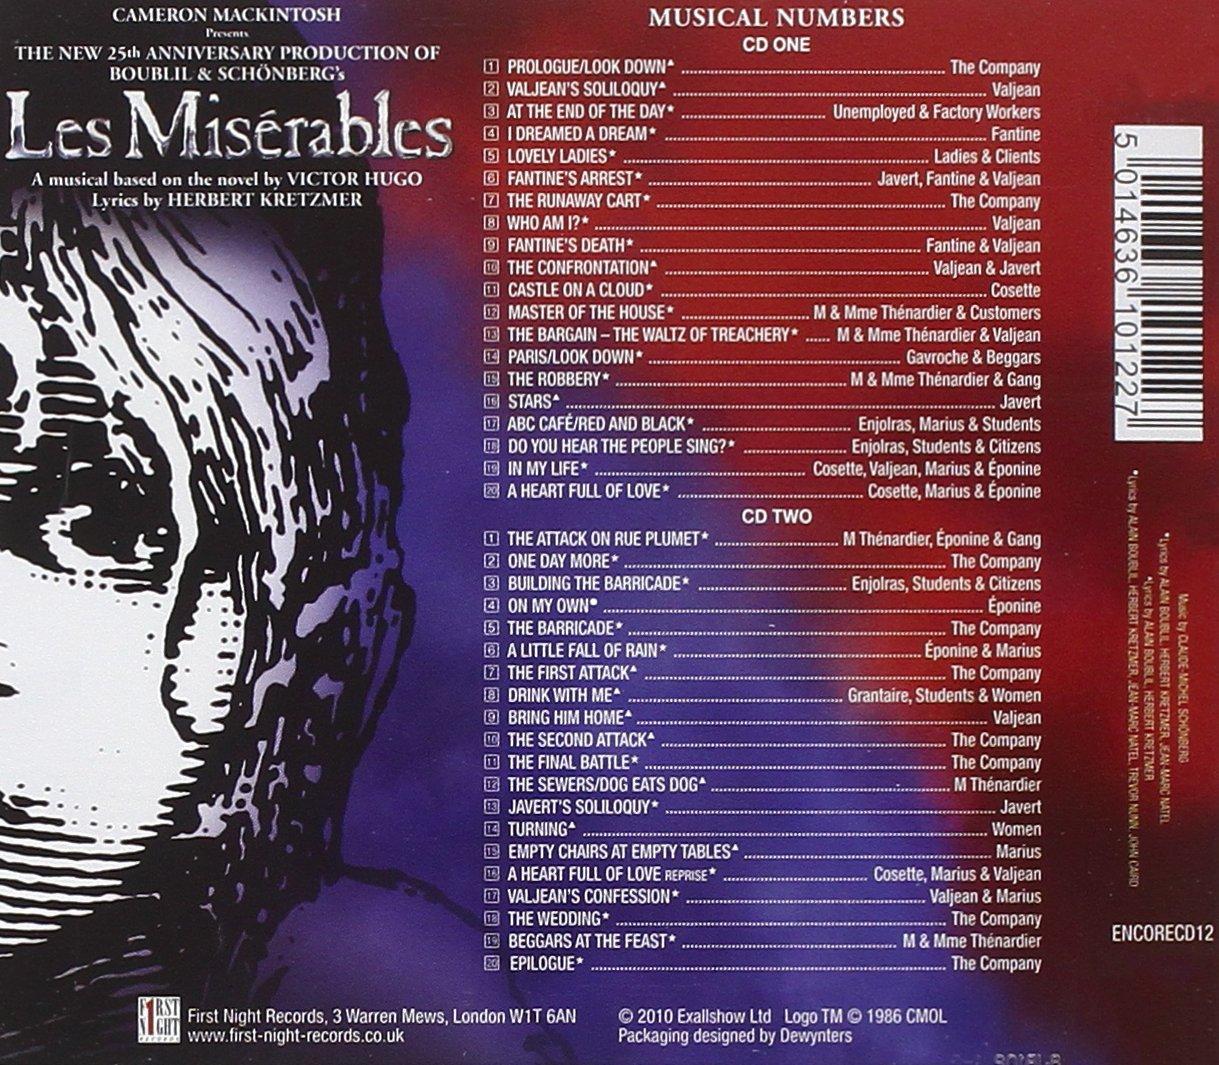 les miserables 25th anniversary recording